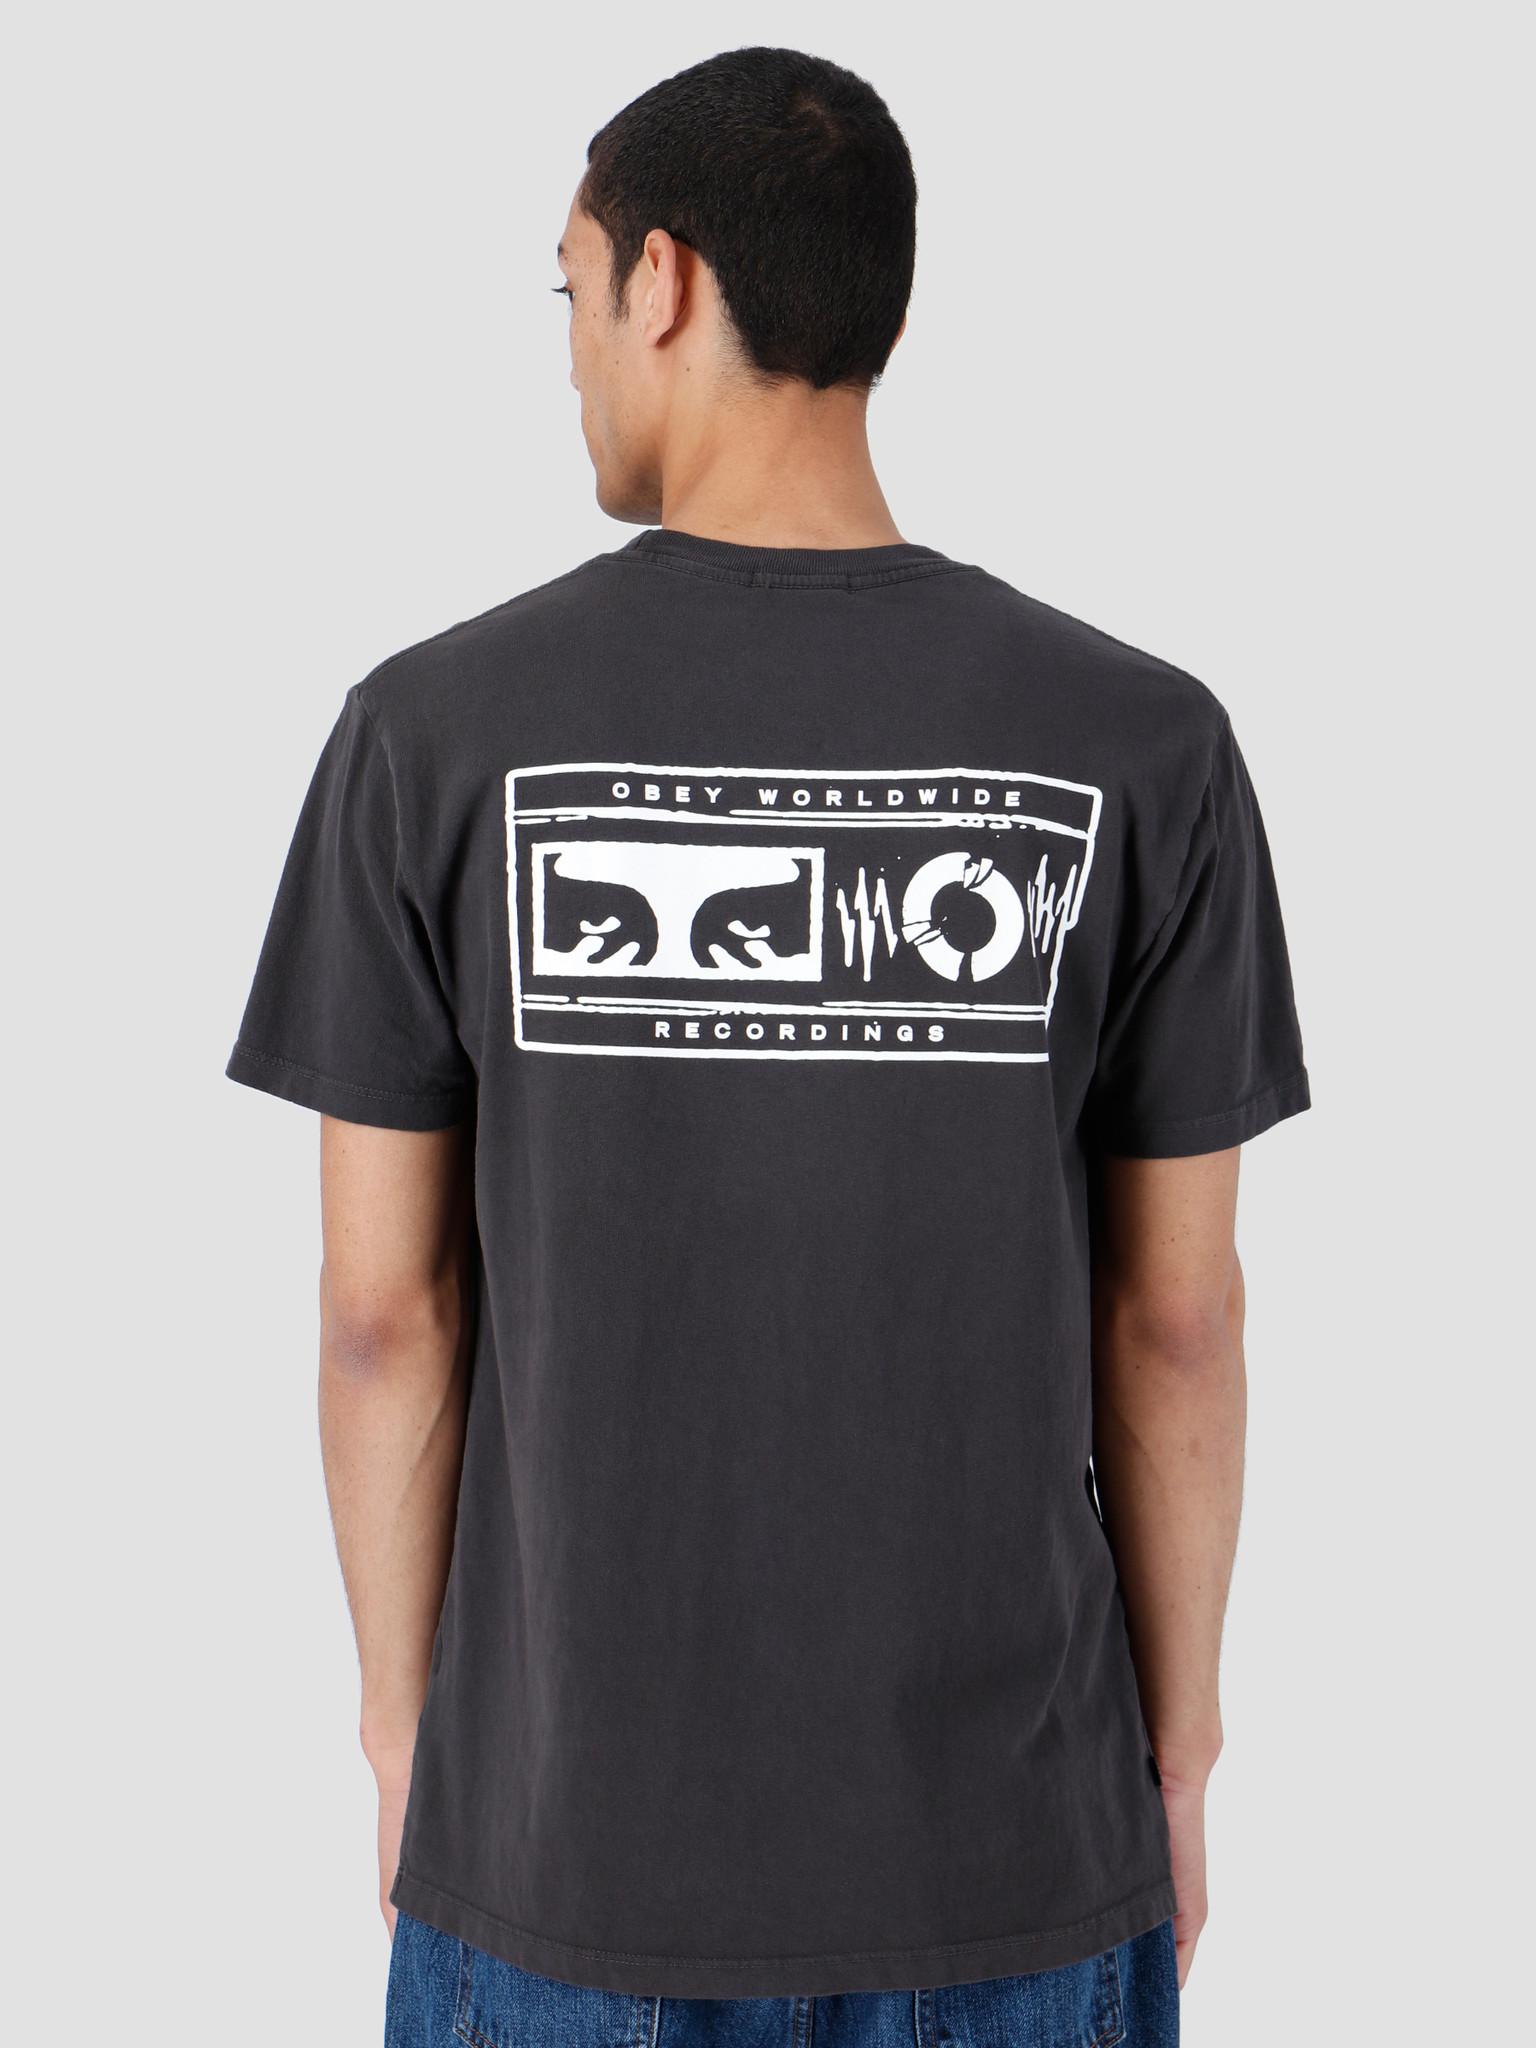 Obey Obey Basic Pigment T-Shirt Dusty Black 166721995-DBA